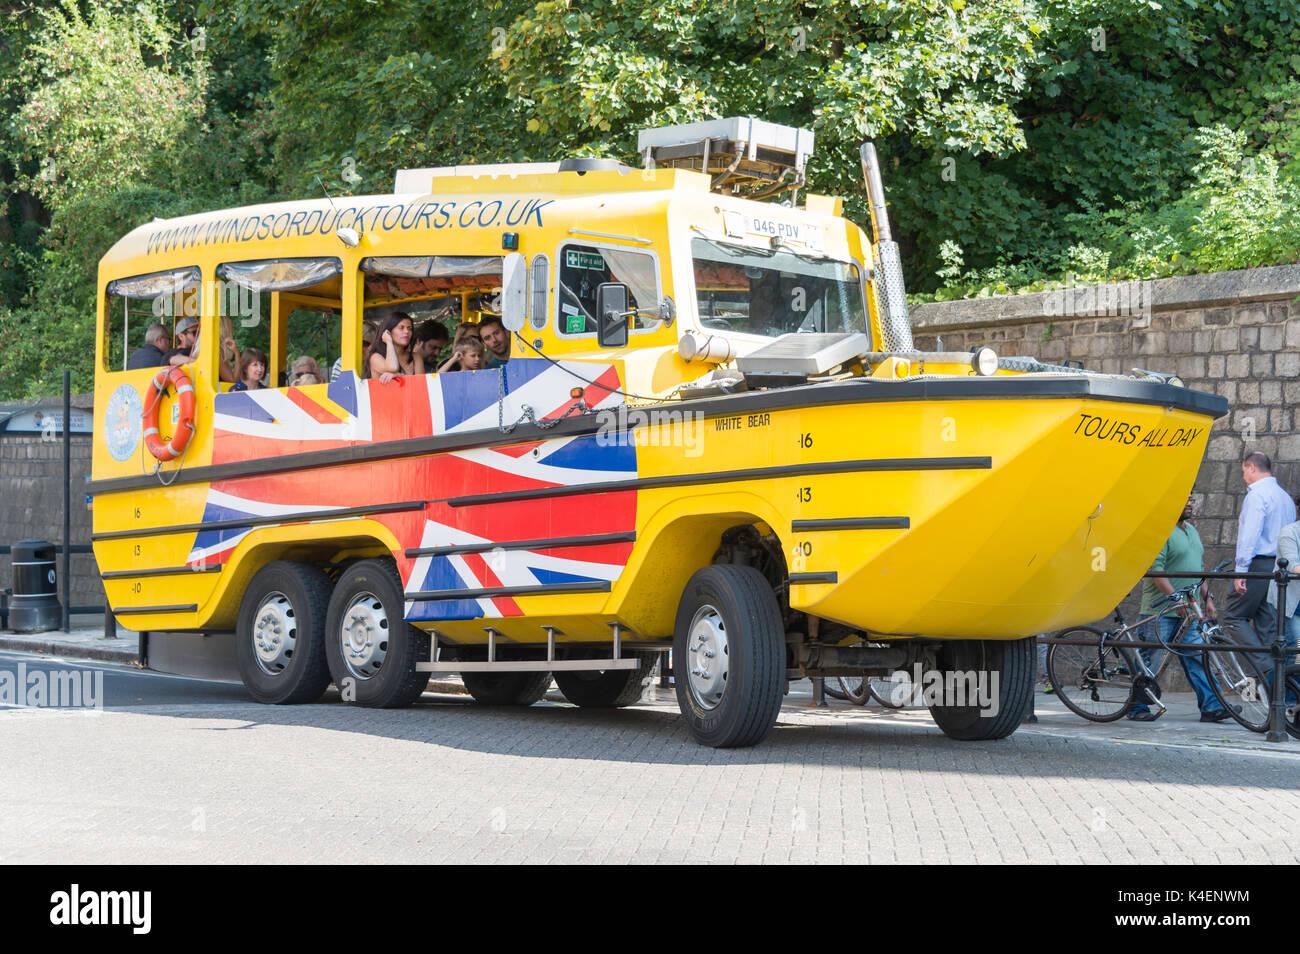 Windsor Duck Tours amphibious vehicle, High Street, Windsor, Berkshire, England, United Kingdom - Stock Image